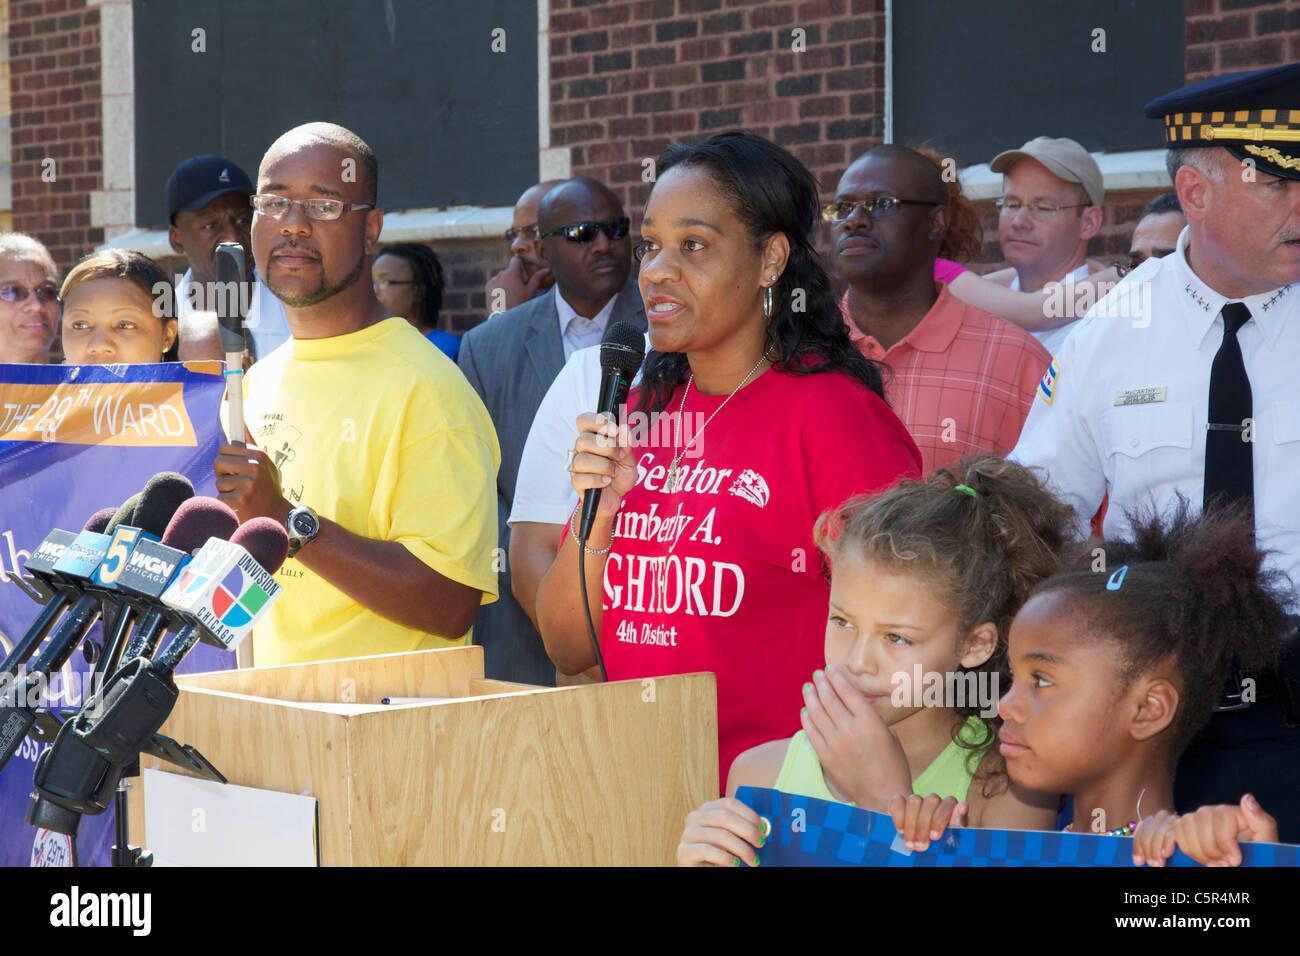 Illinois State Senator Kimberly Lightford speaks at an anti-violence rally in Chicago's Austin neighborhood. - Stock Image